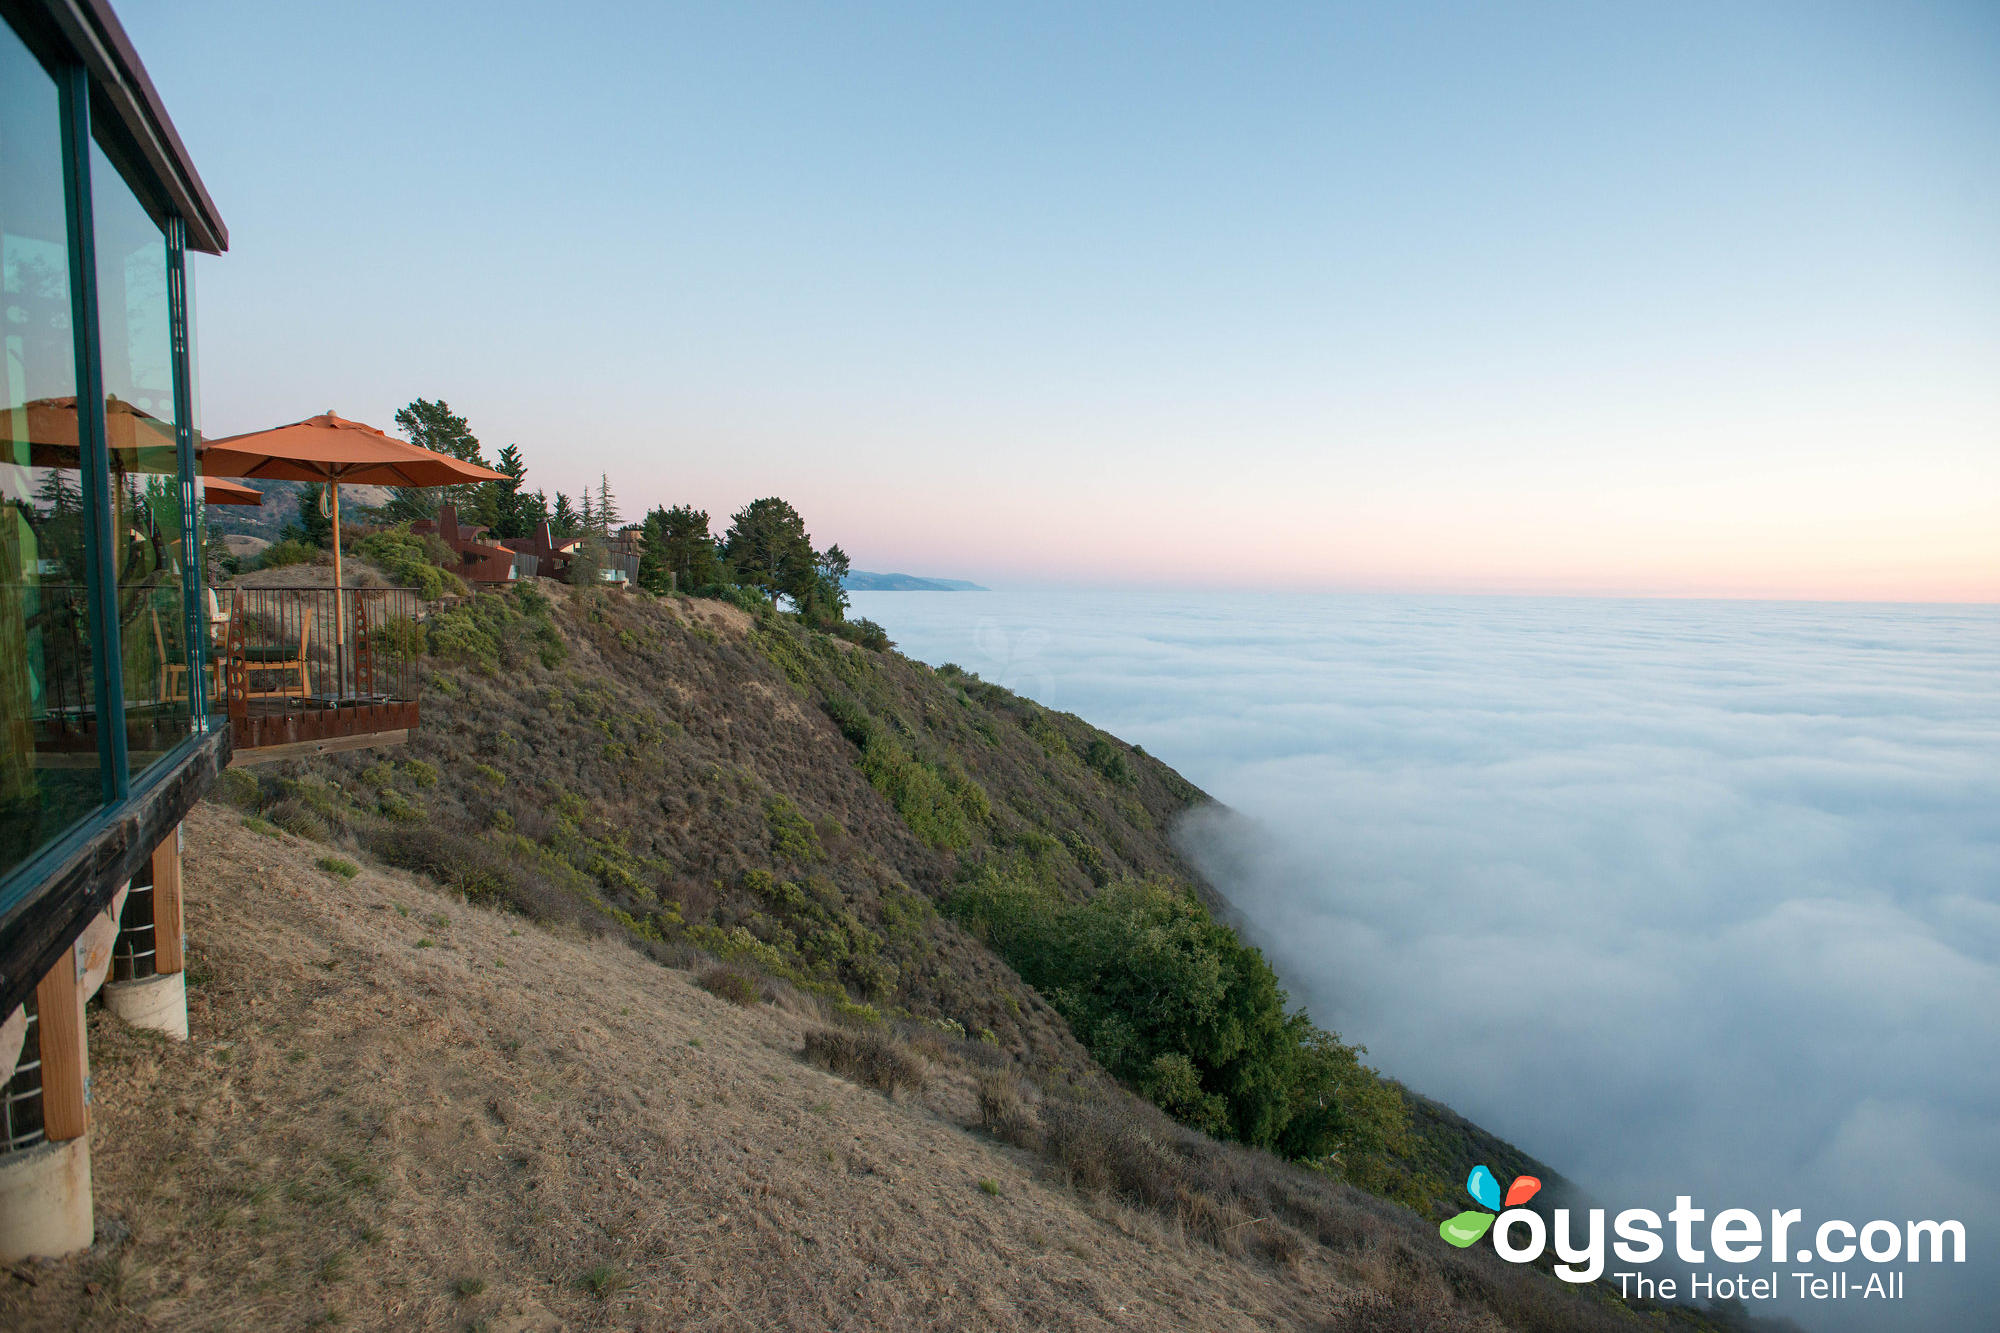 california's 15 most romantic resorts | huffpost life